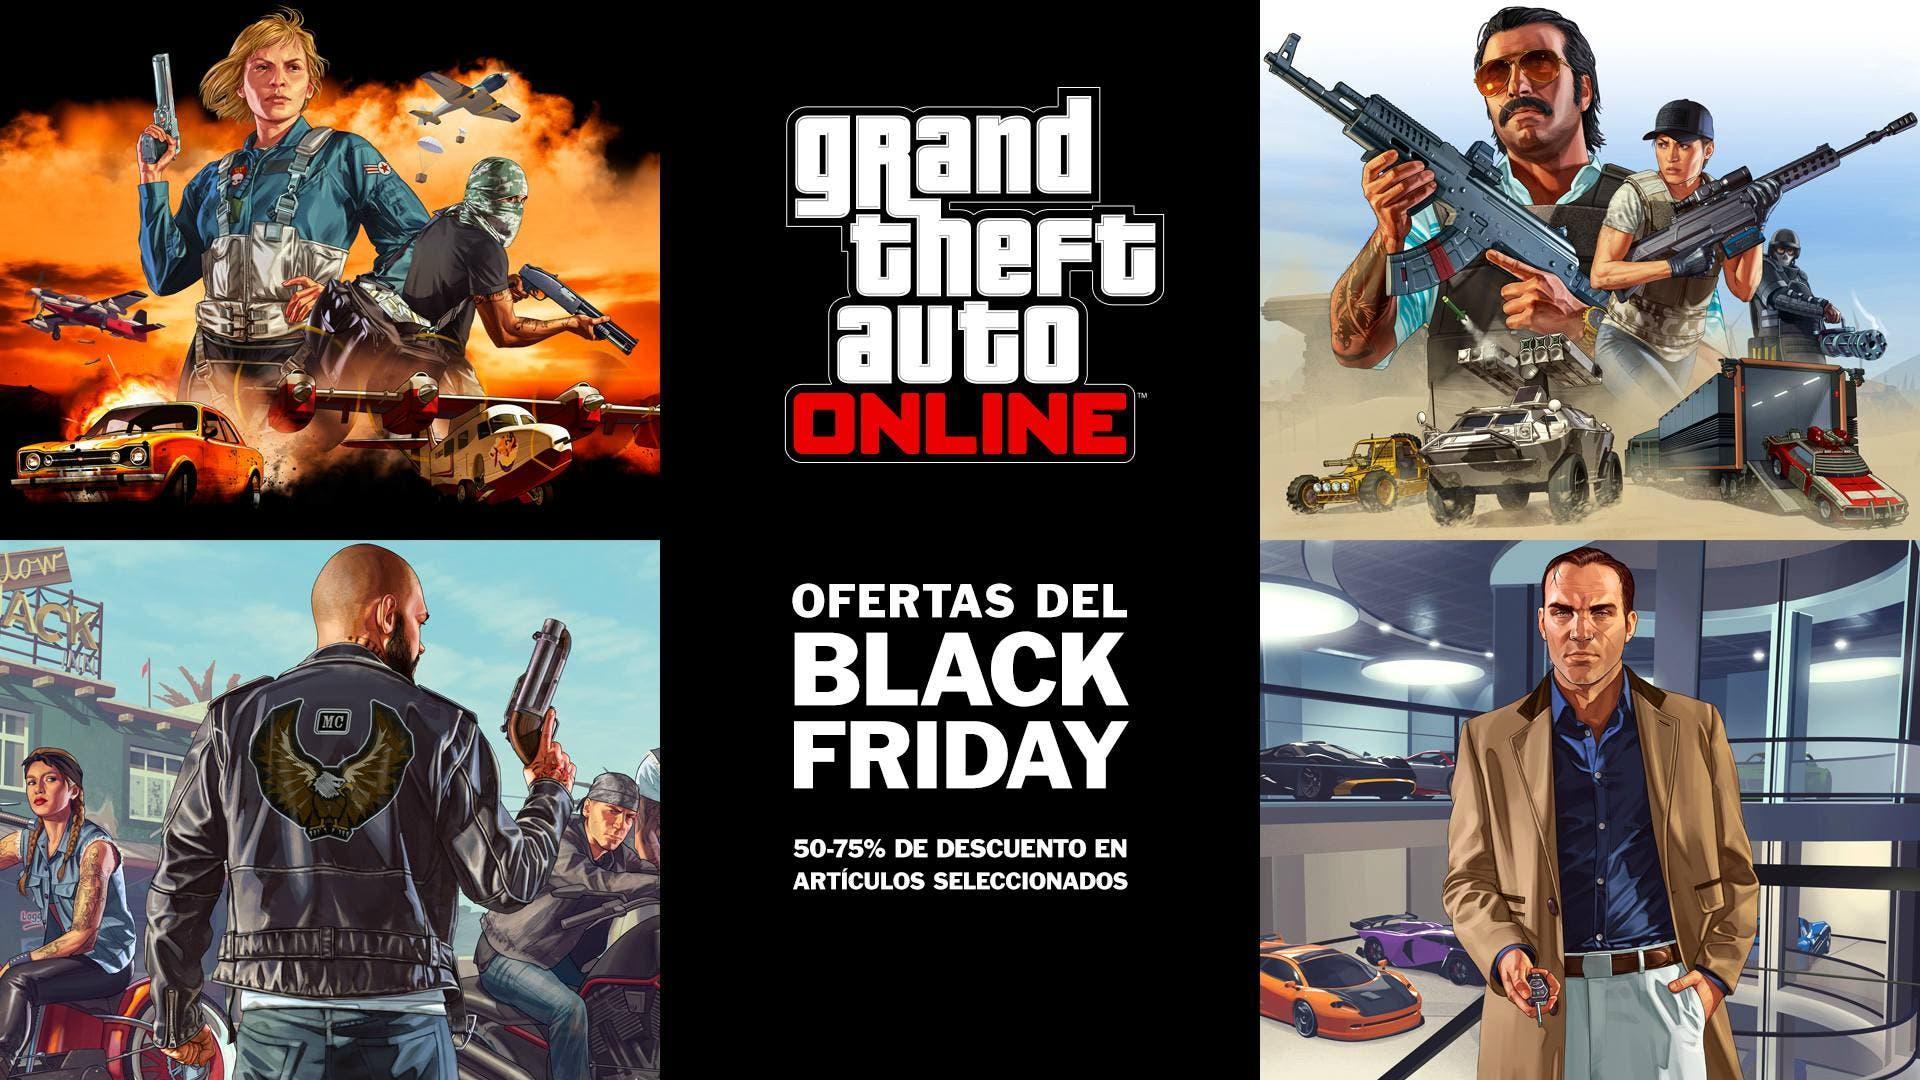 Black Friday también llega a GTA 5 Online